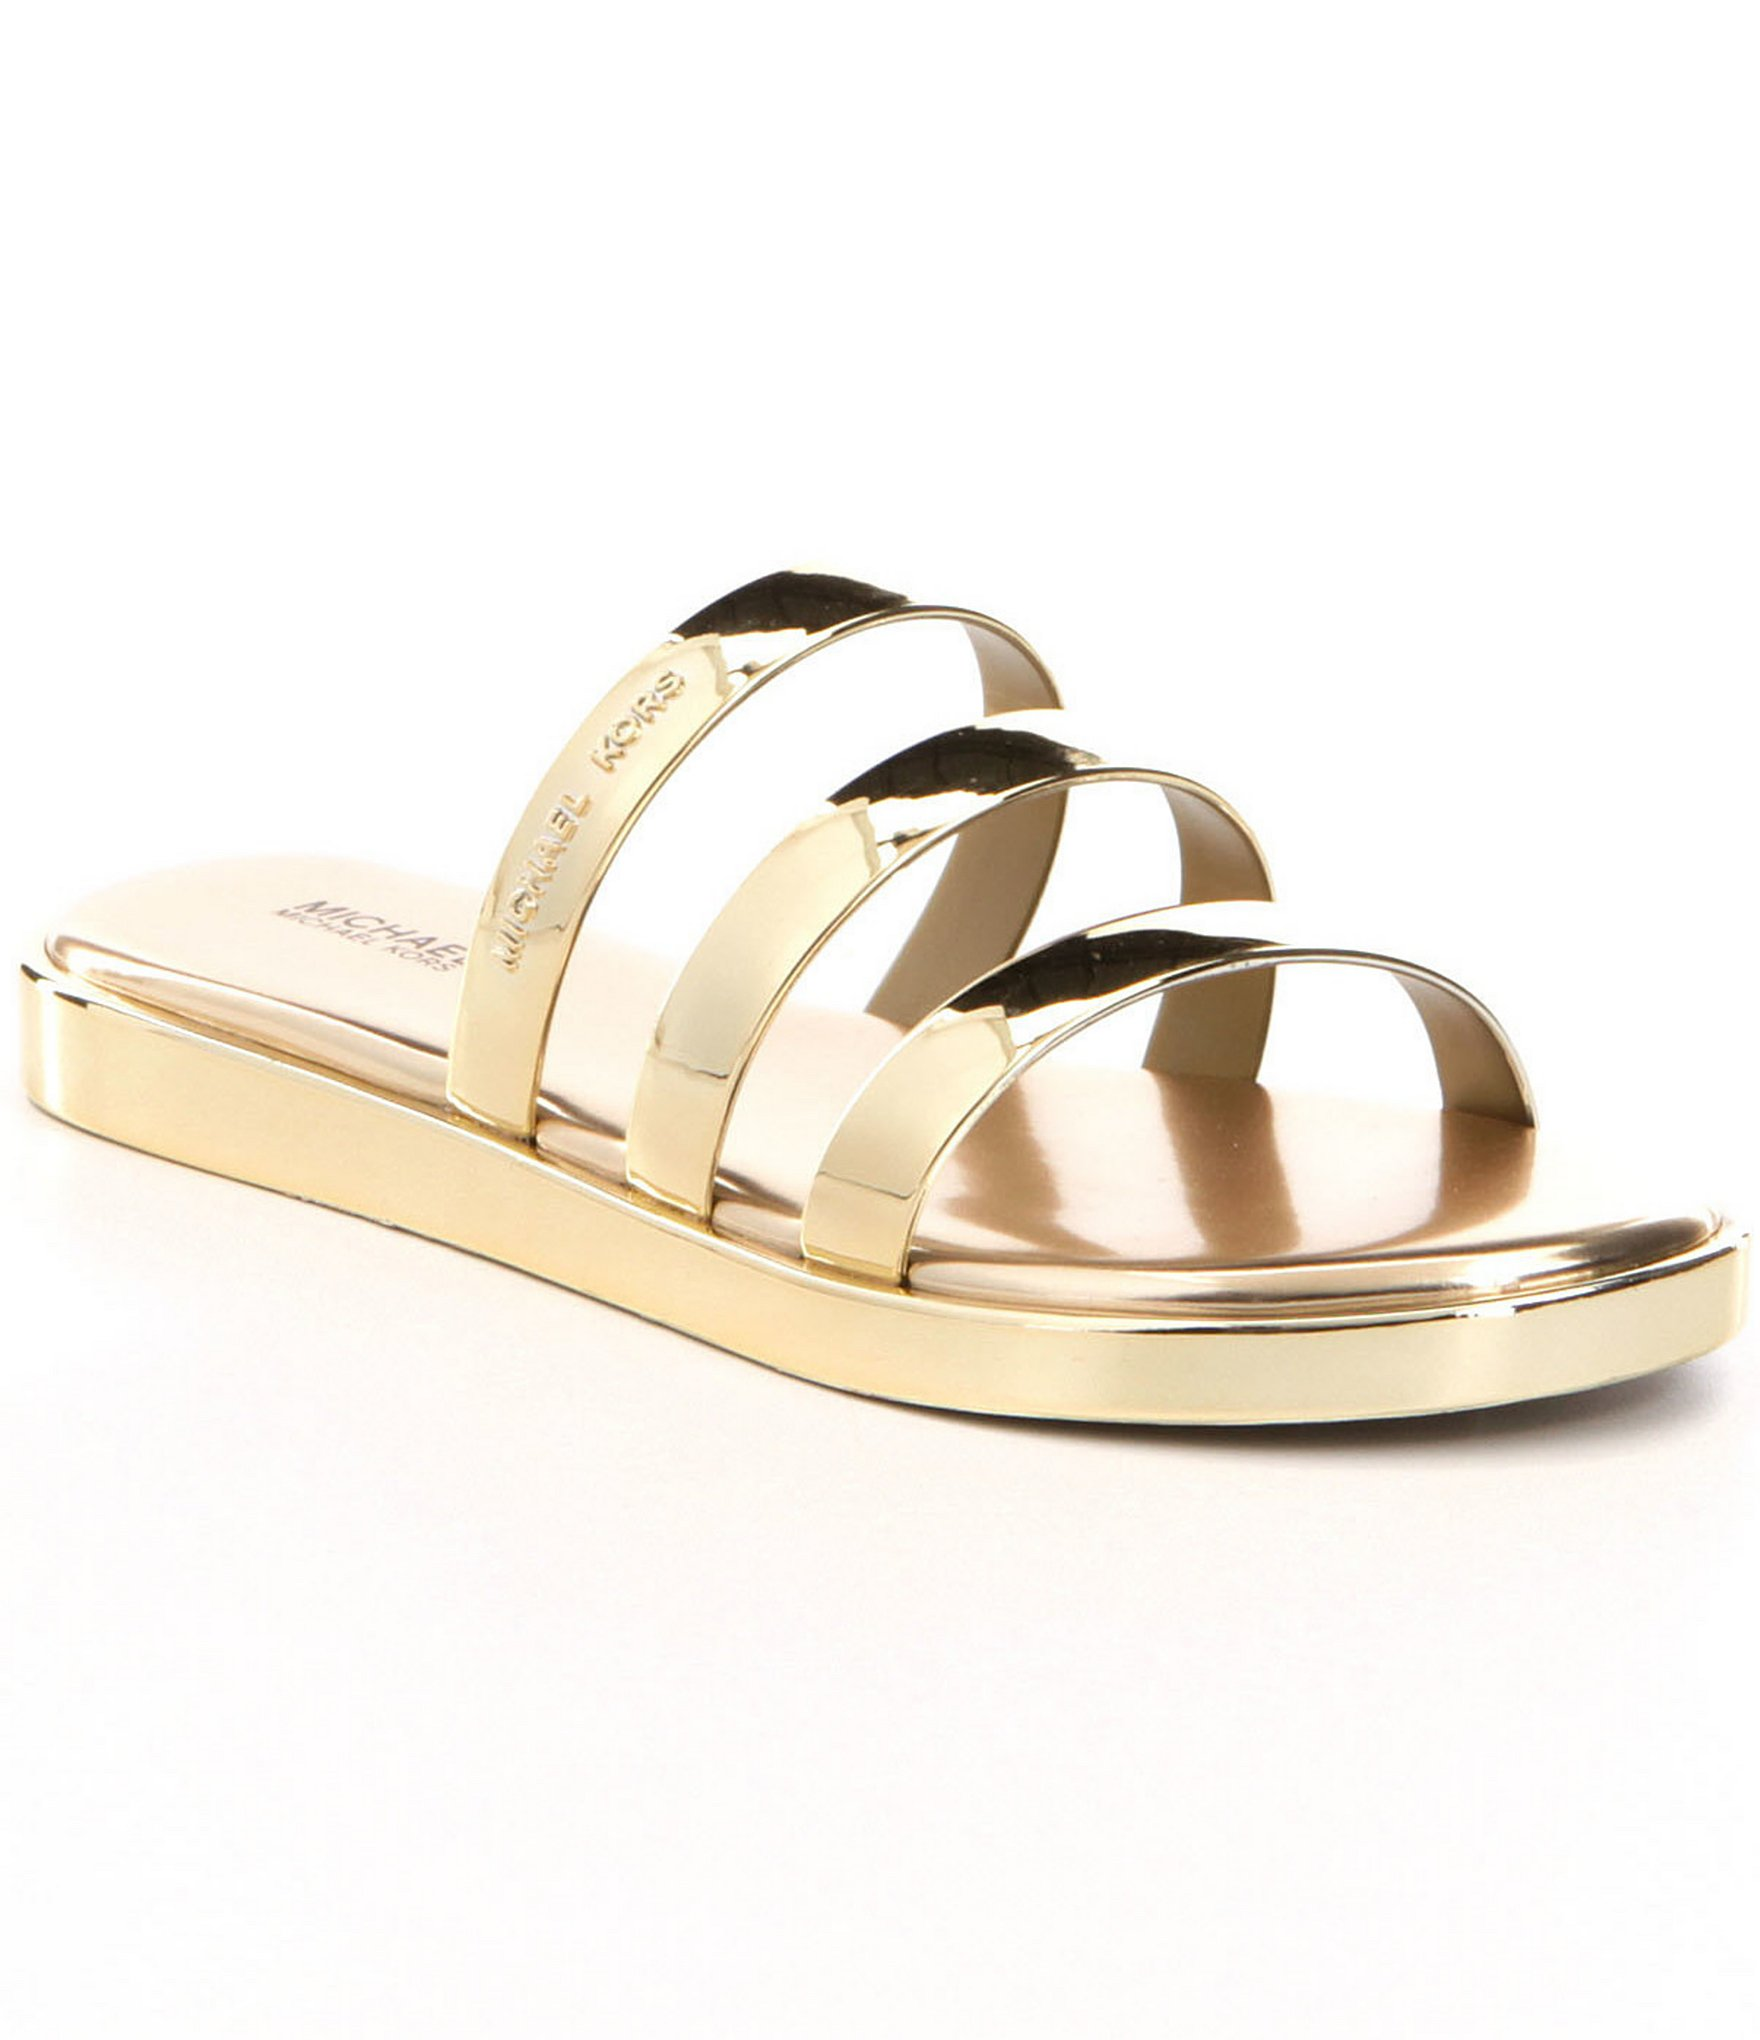 MICHAEL Michael Kors Metallic Keiko Strappy Slide-on Sandals | Dillards